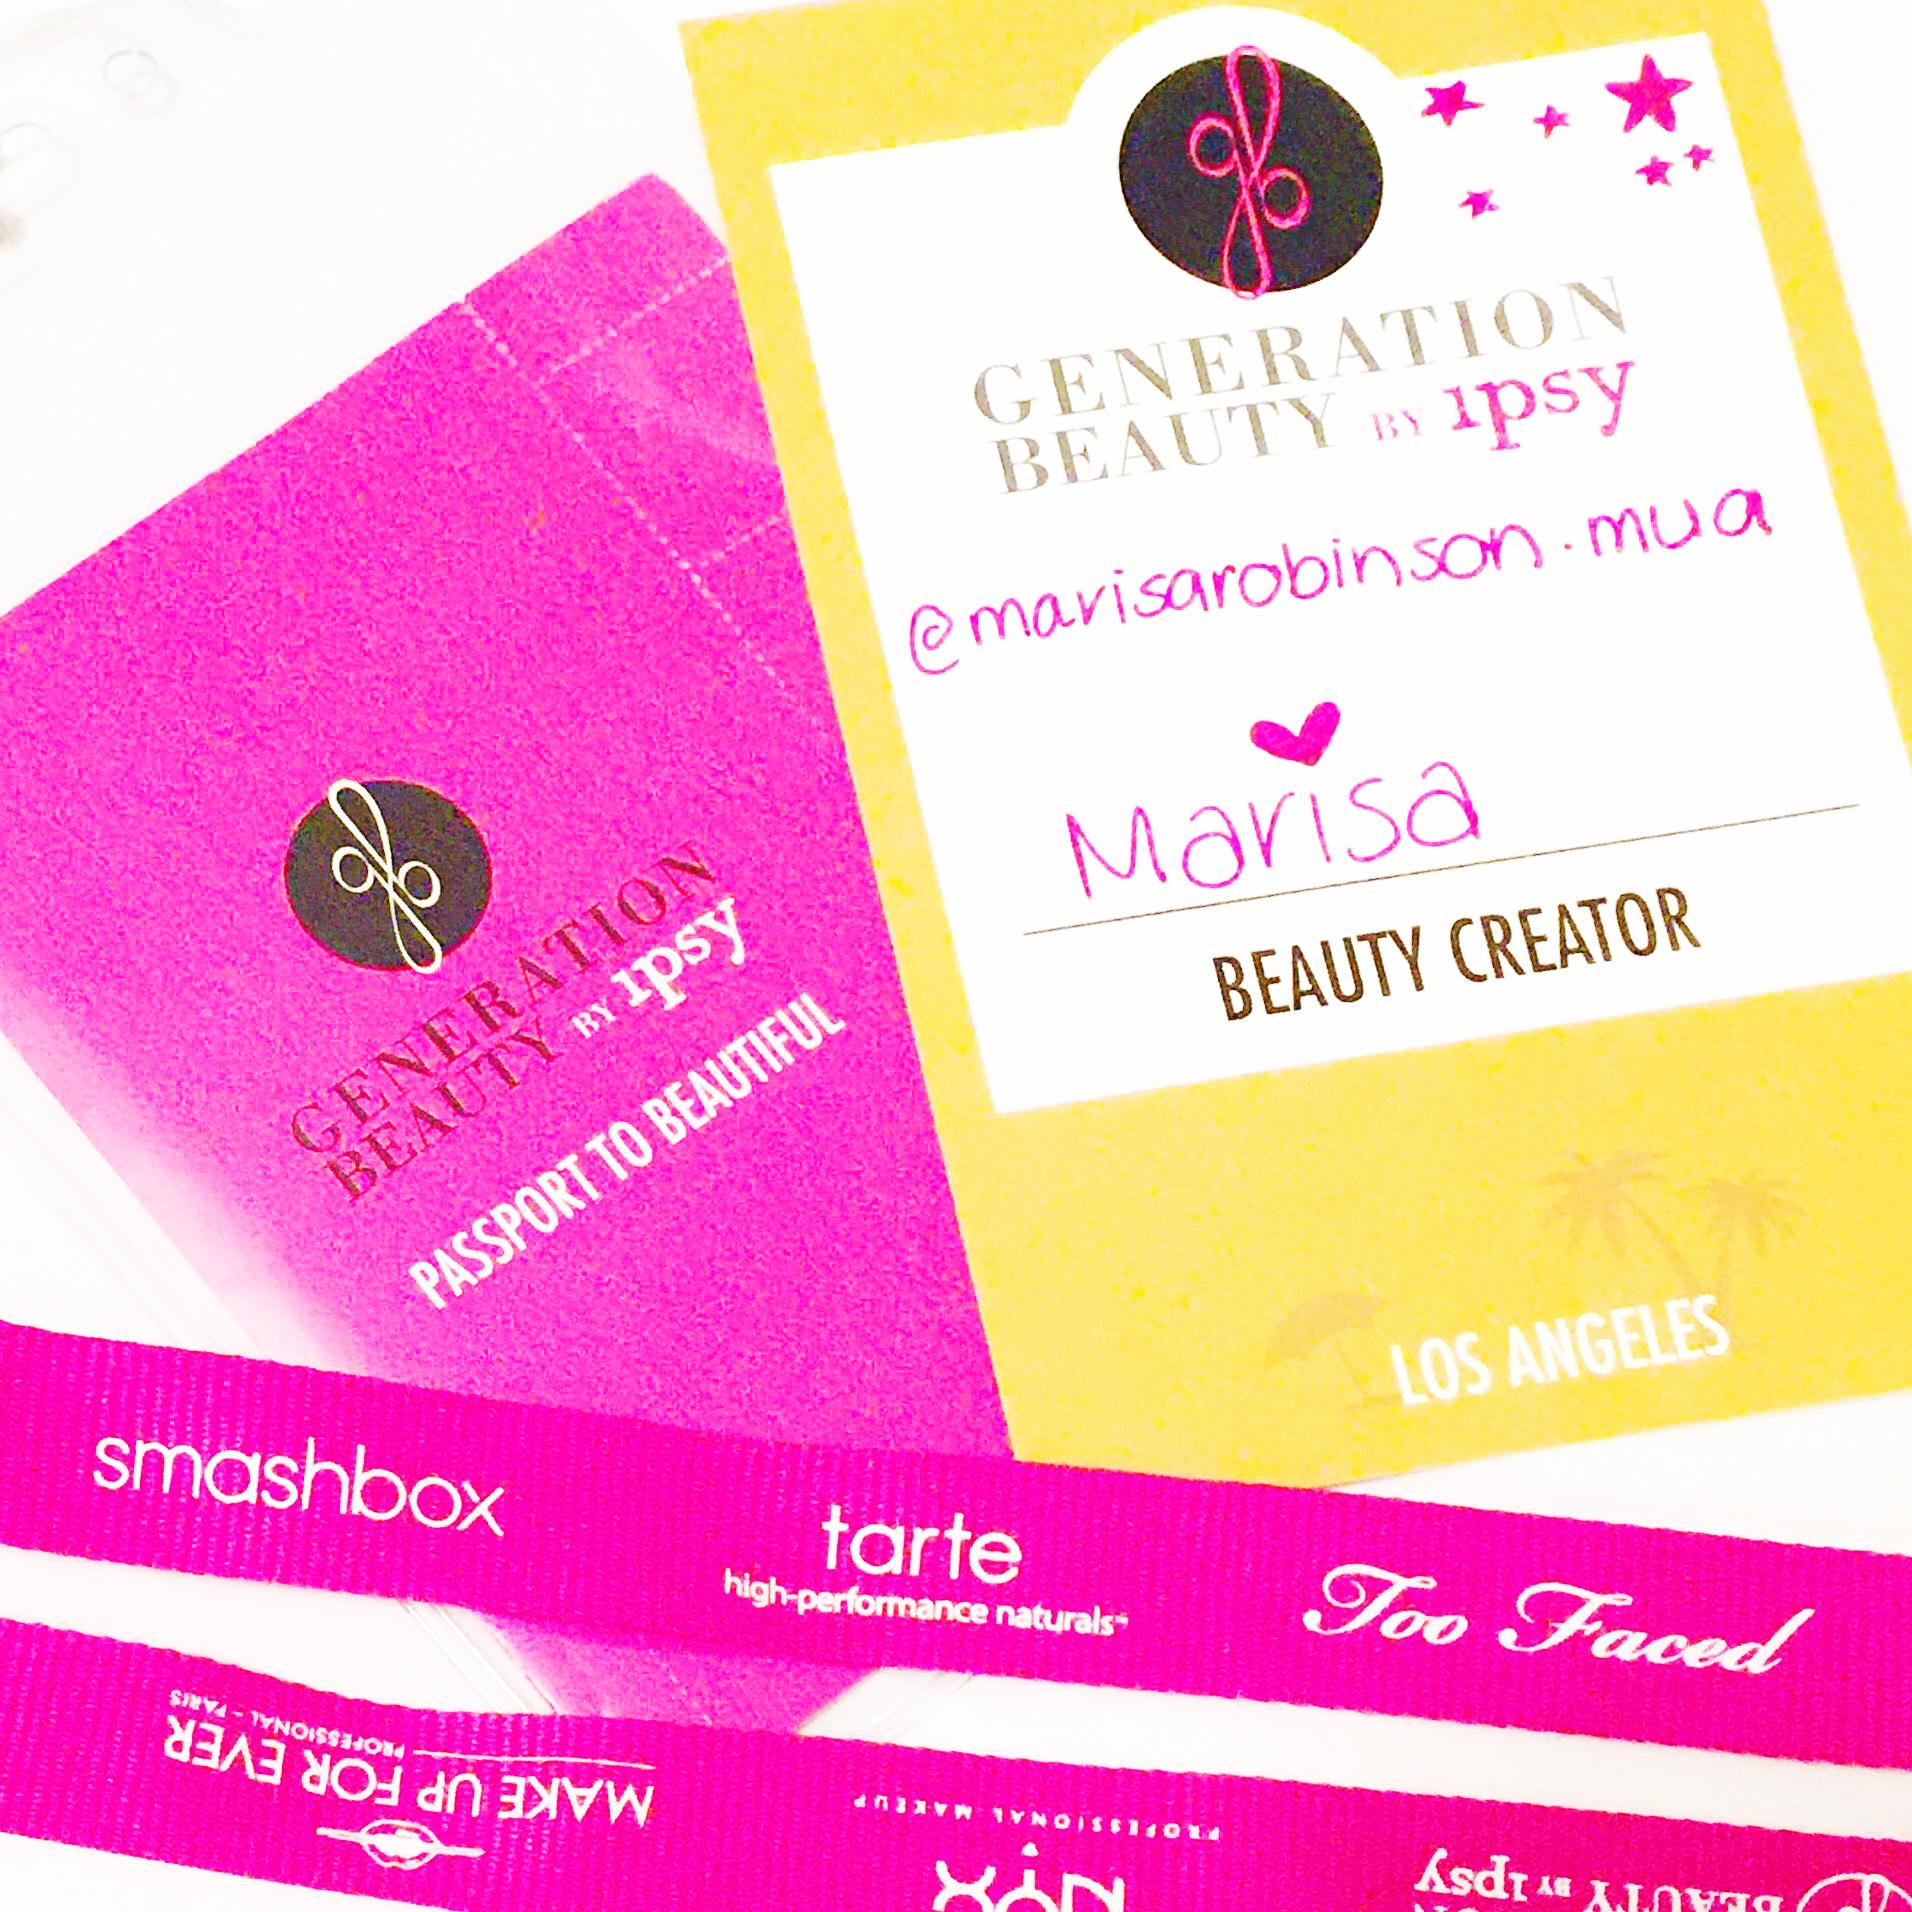 Marisa Robinson Makeup Artist Generation Beauty by Ipsy Passport to Beauty